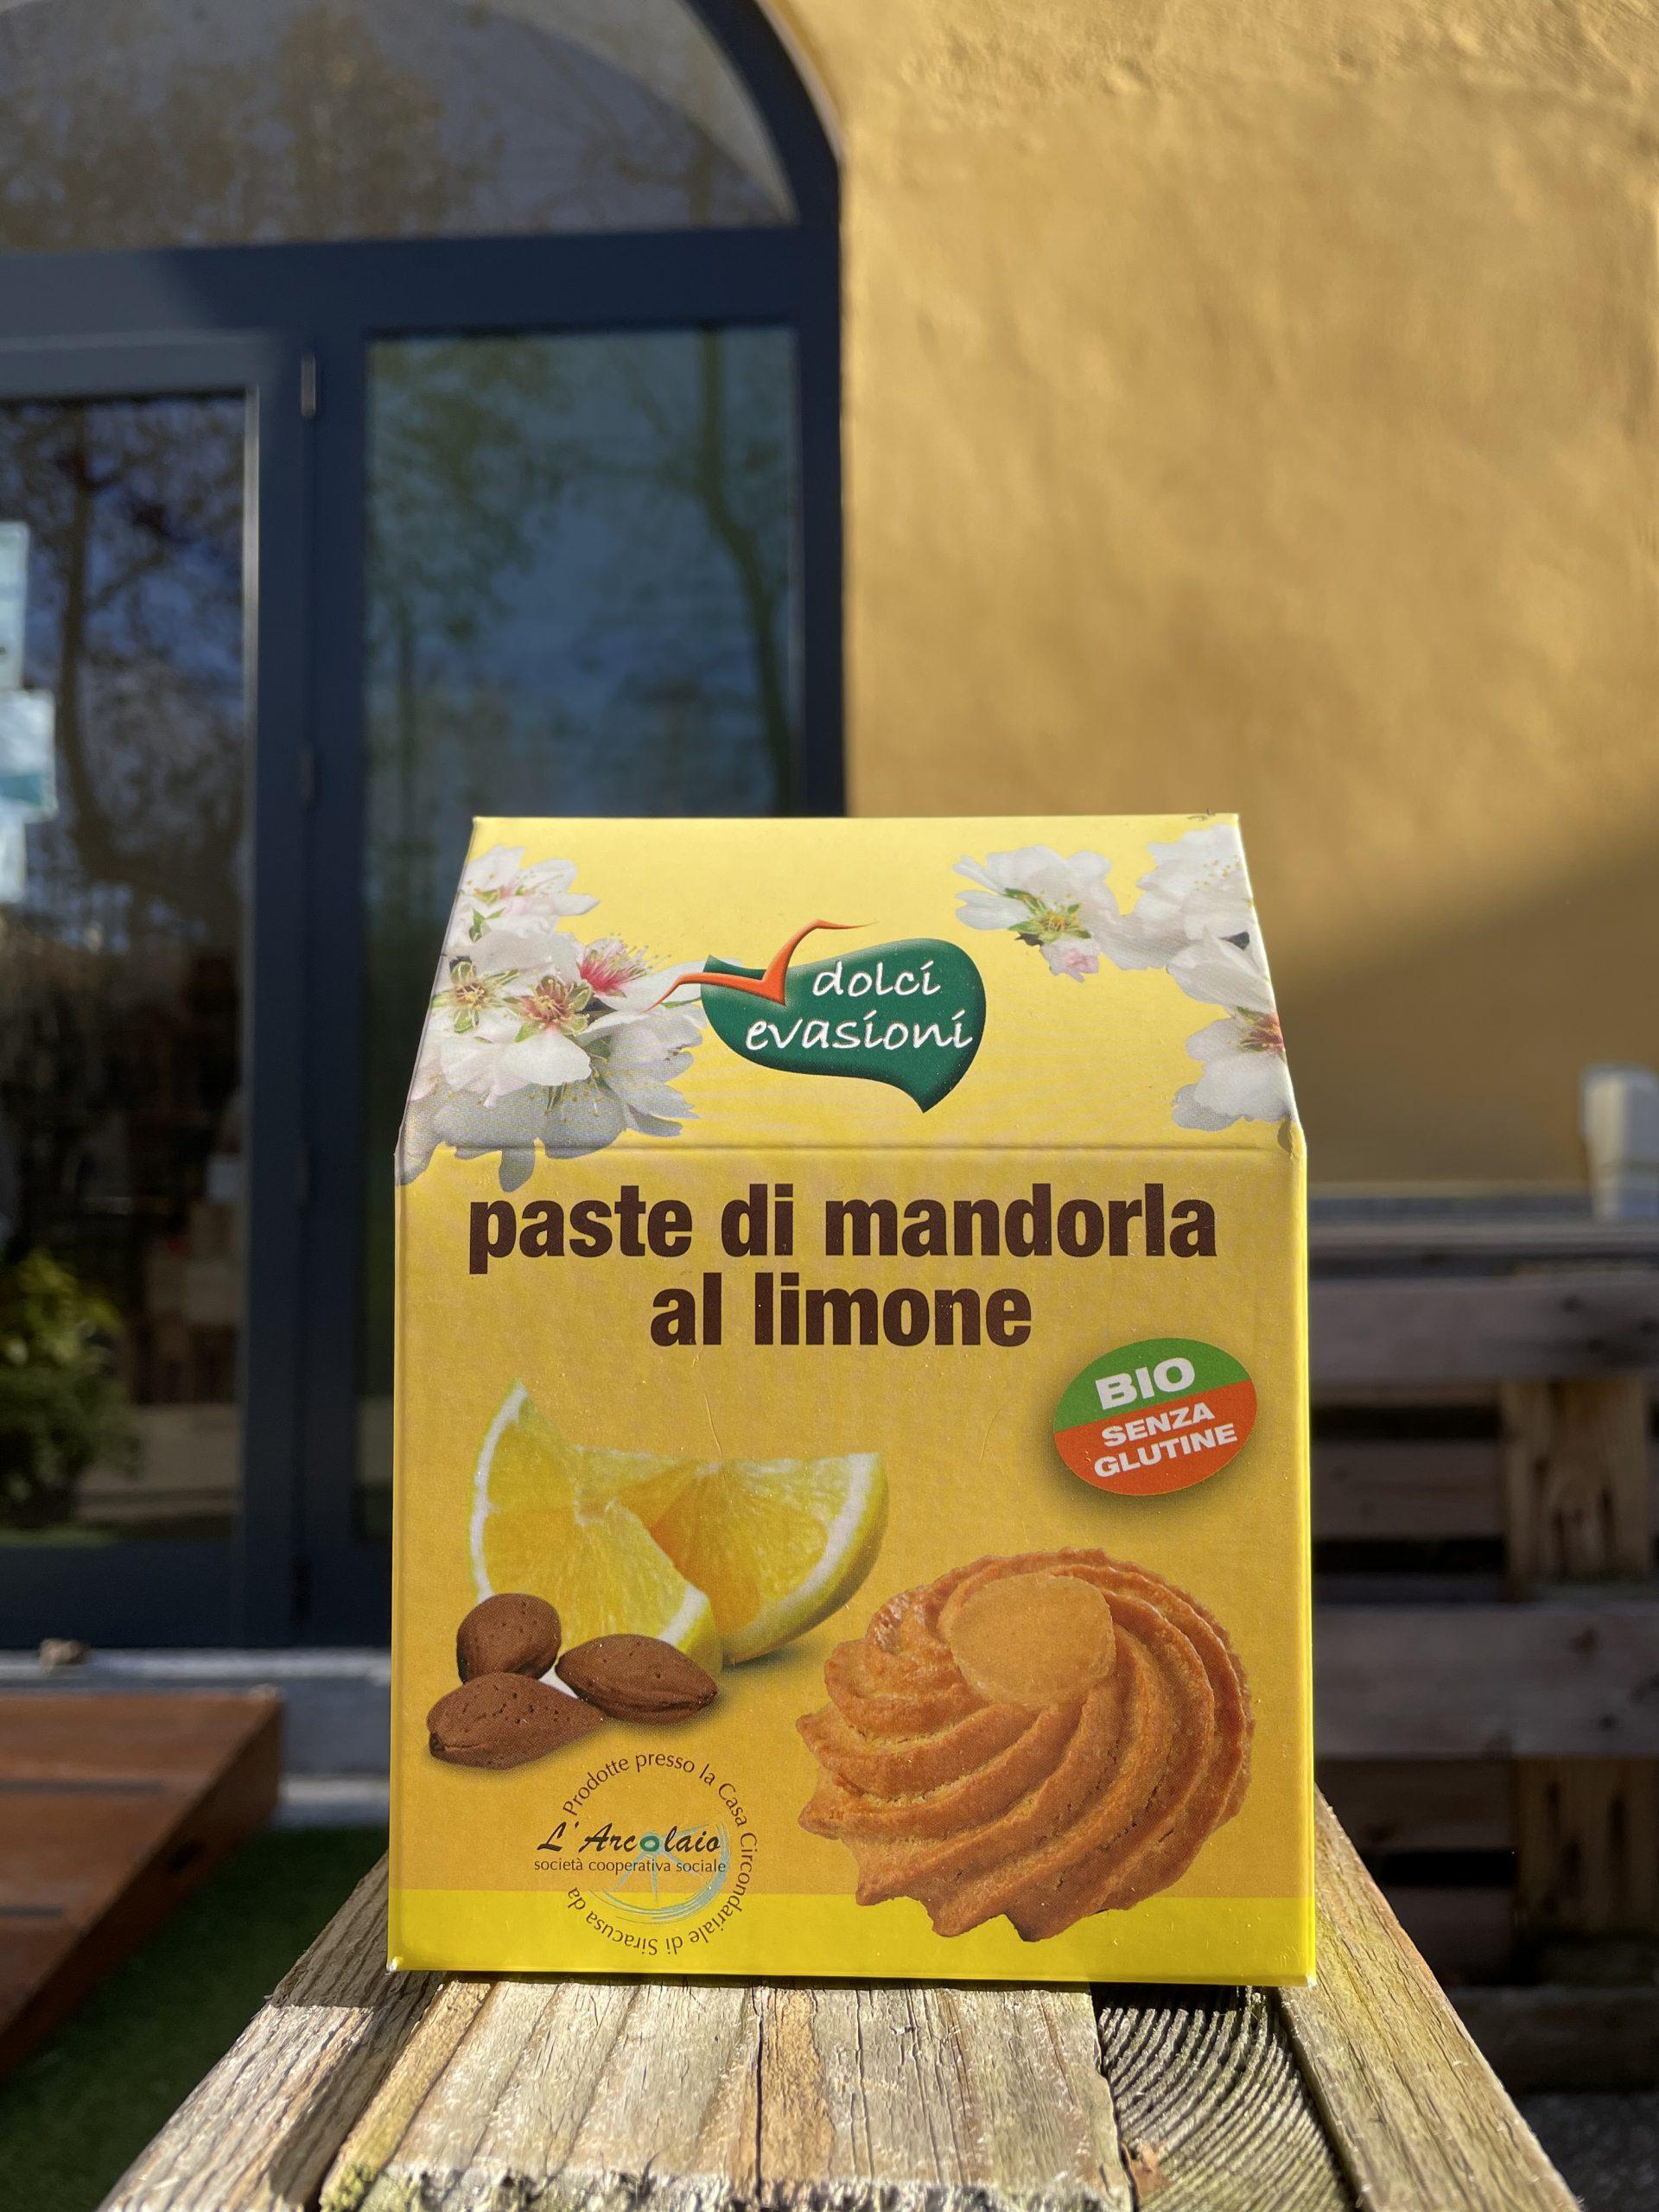 Paste di mandorla al limone – Dolci Evasioni